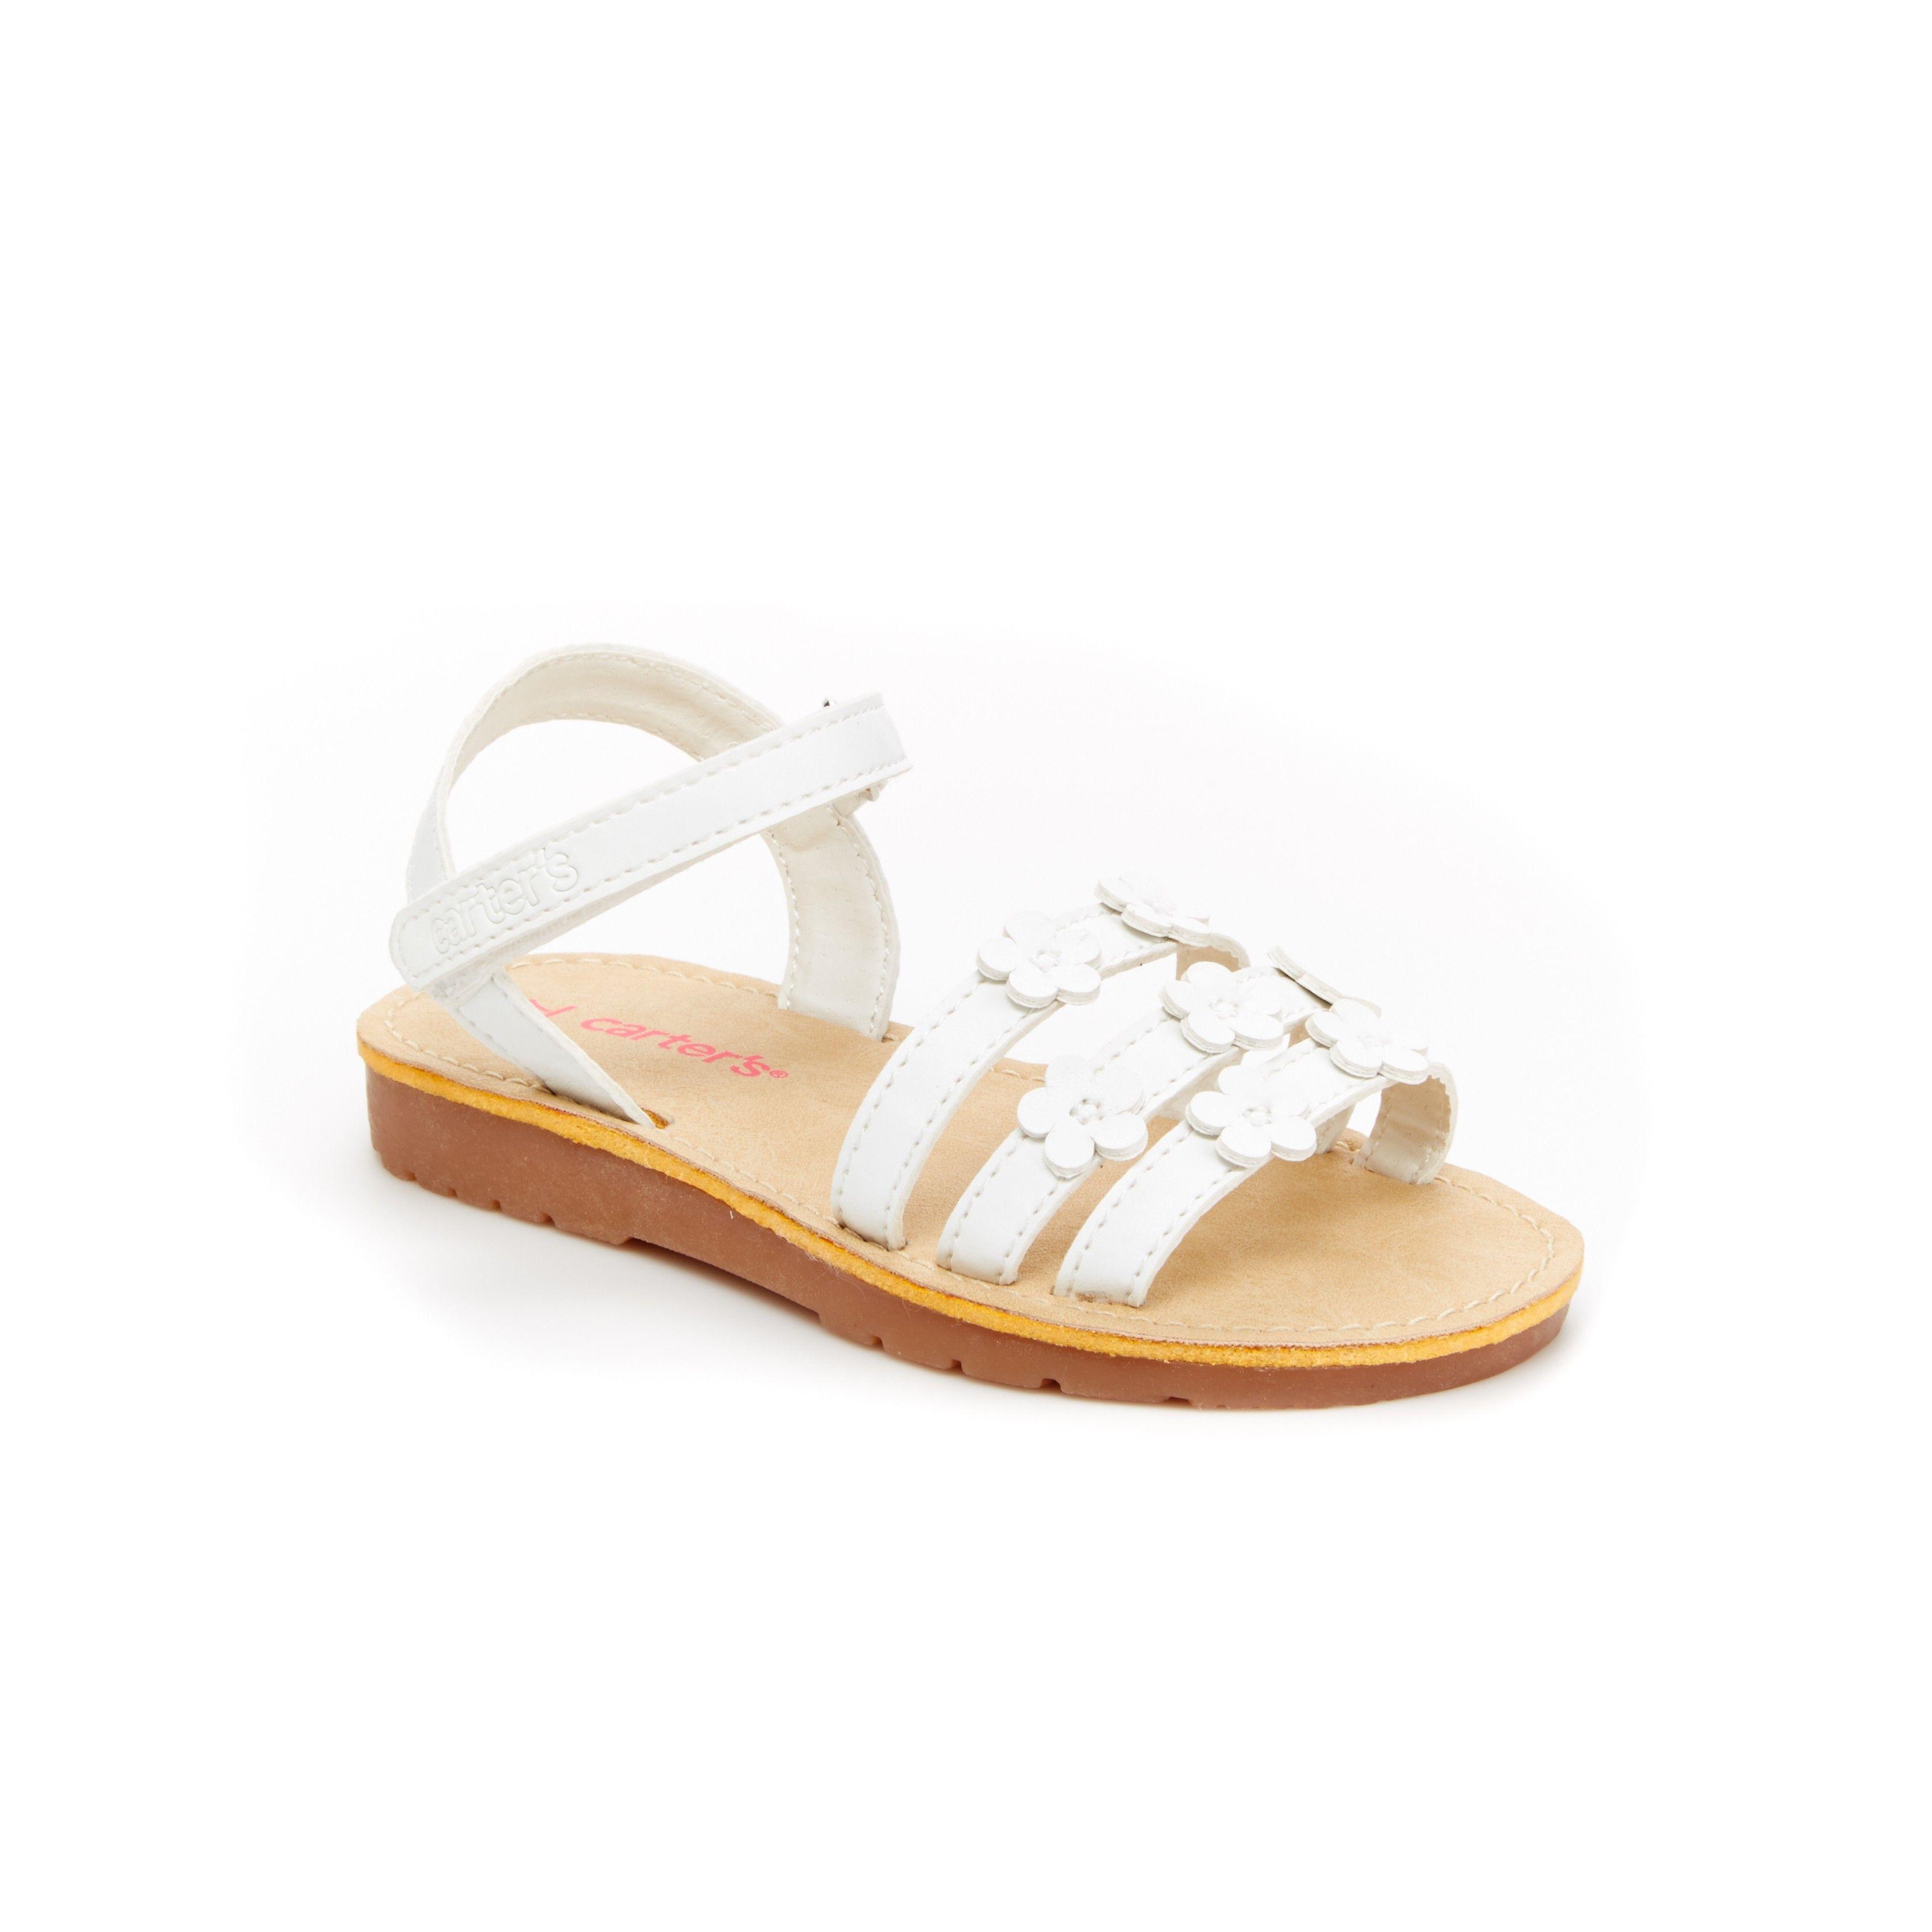 Hopscotch Carters White Sandals With Flower Applique